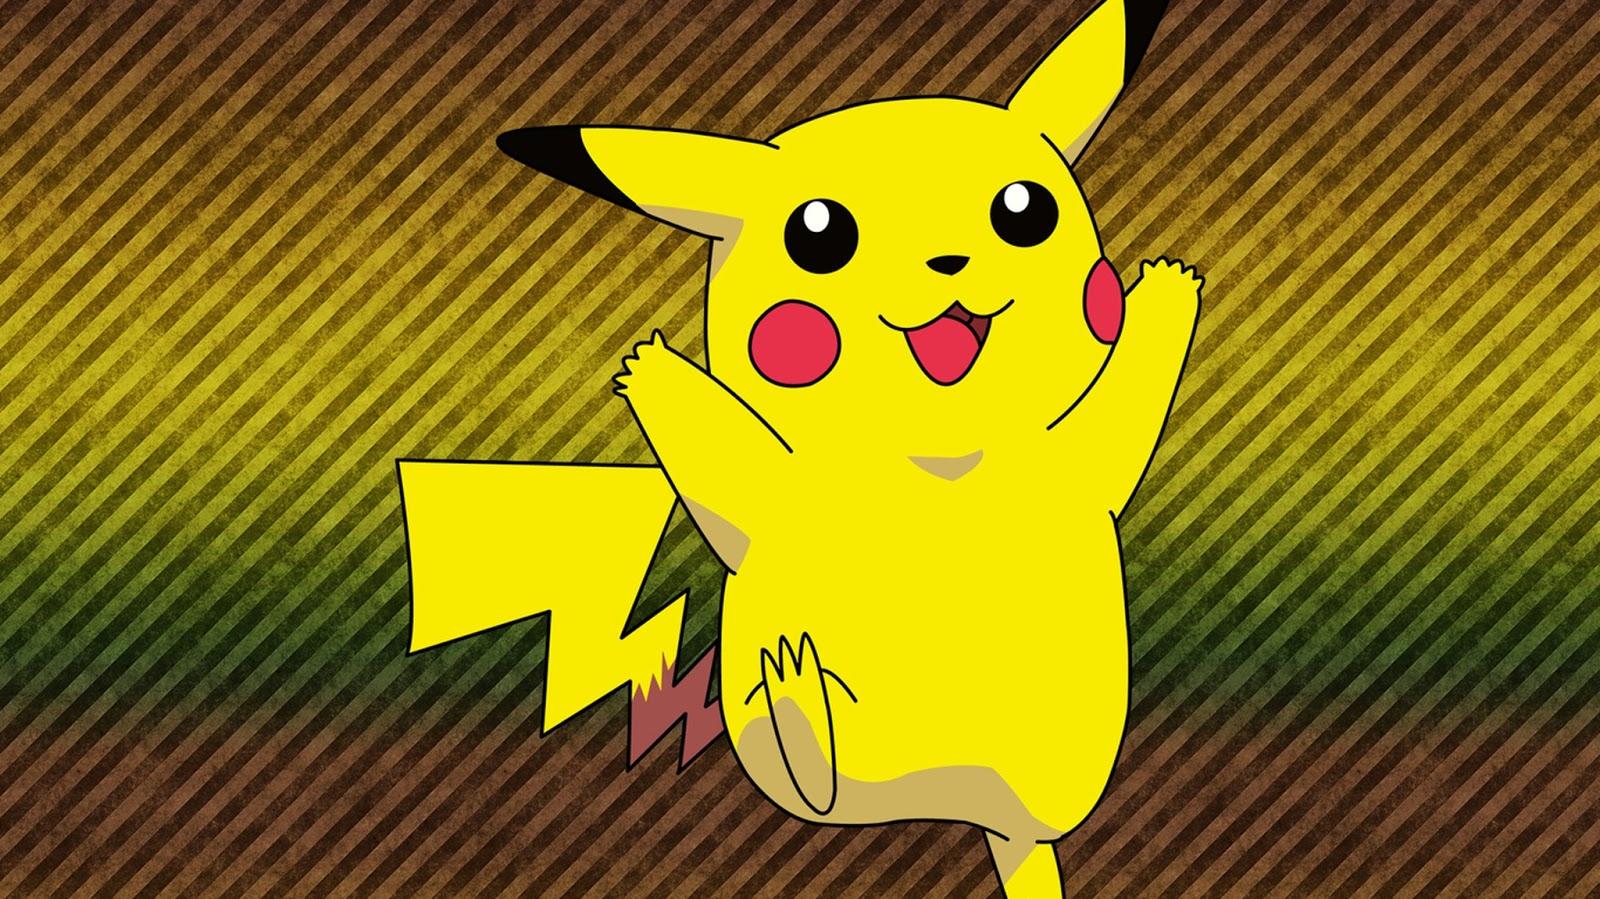 Pikachu Wallpaper Perfect Wallpaper 1600x899